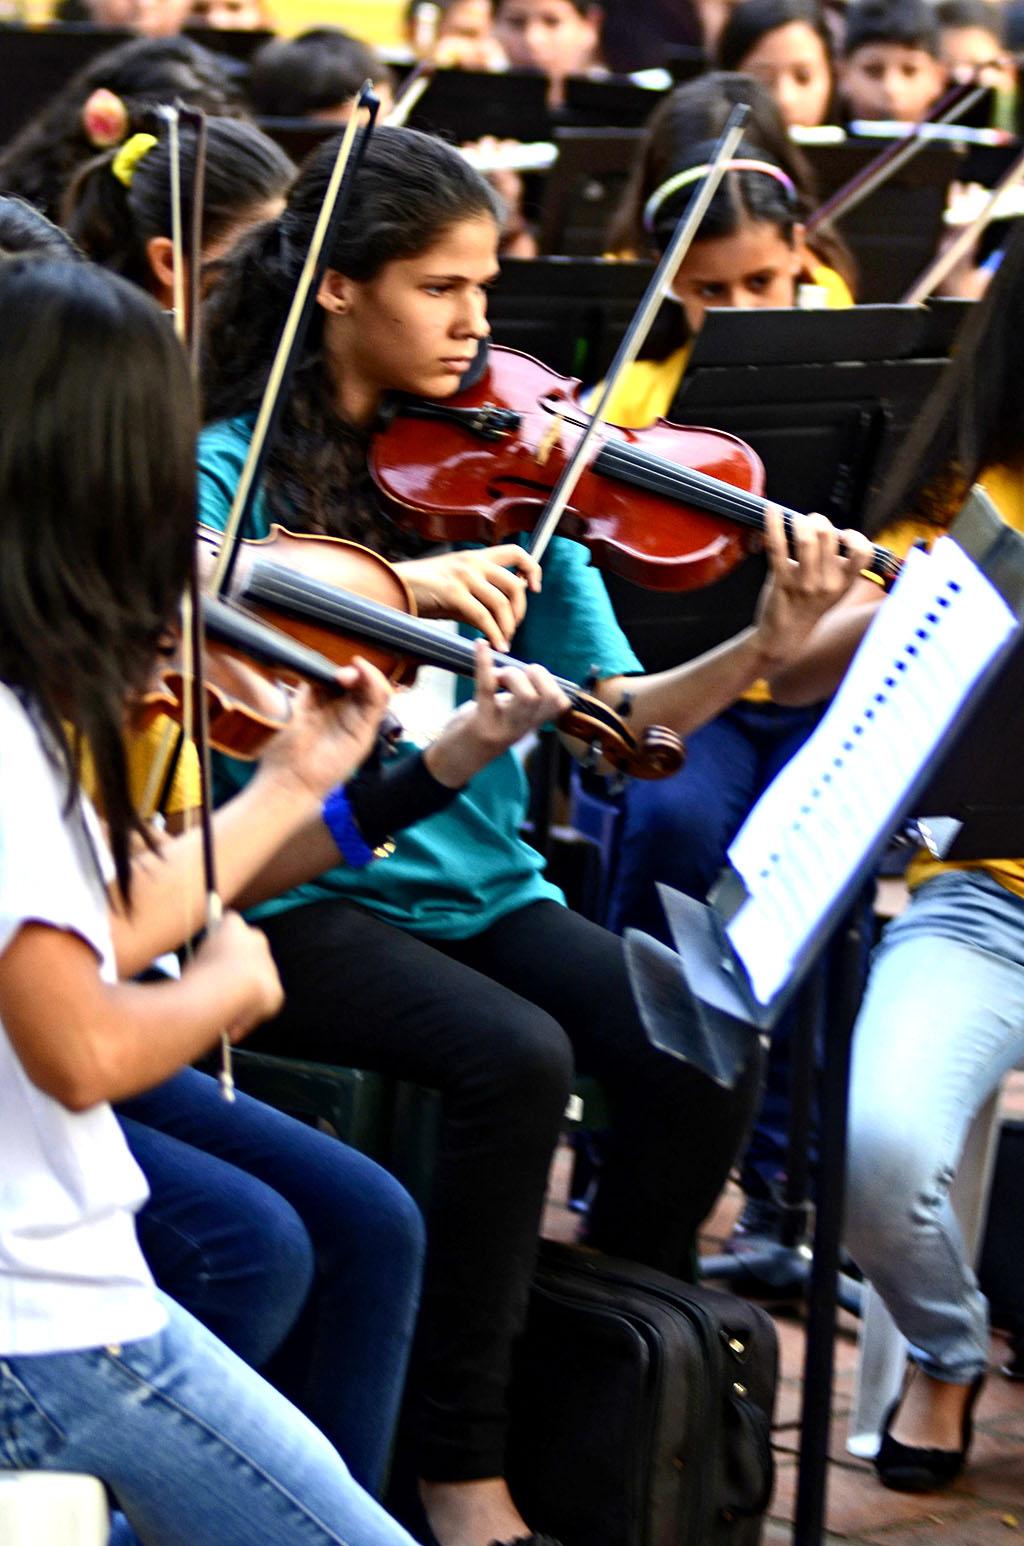 Orquesta Sinfonica Juvenil de Barinas